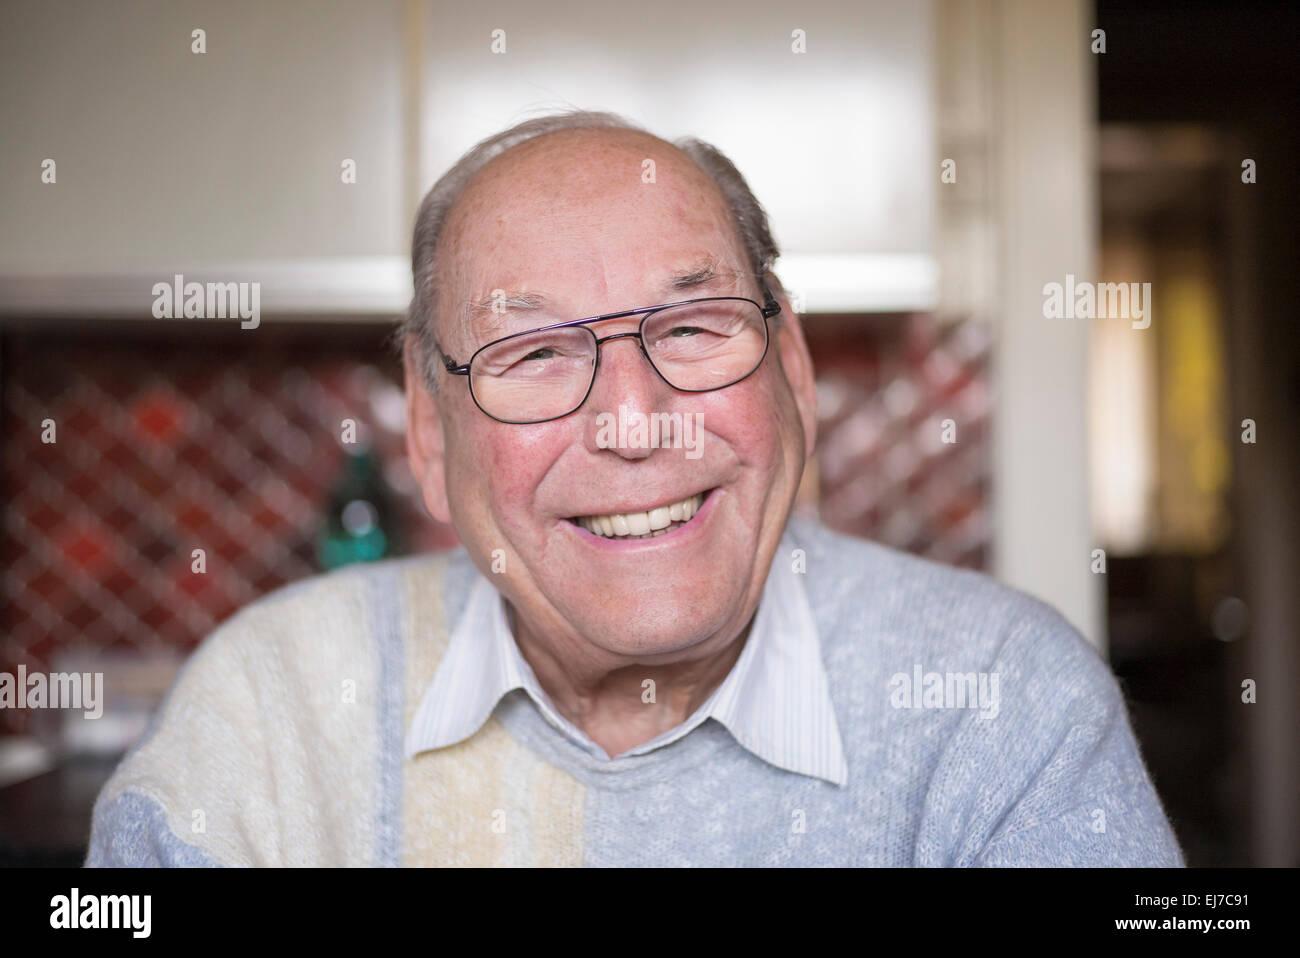 80er Jahre älterer Mann Porträt lächelnd Stockbild